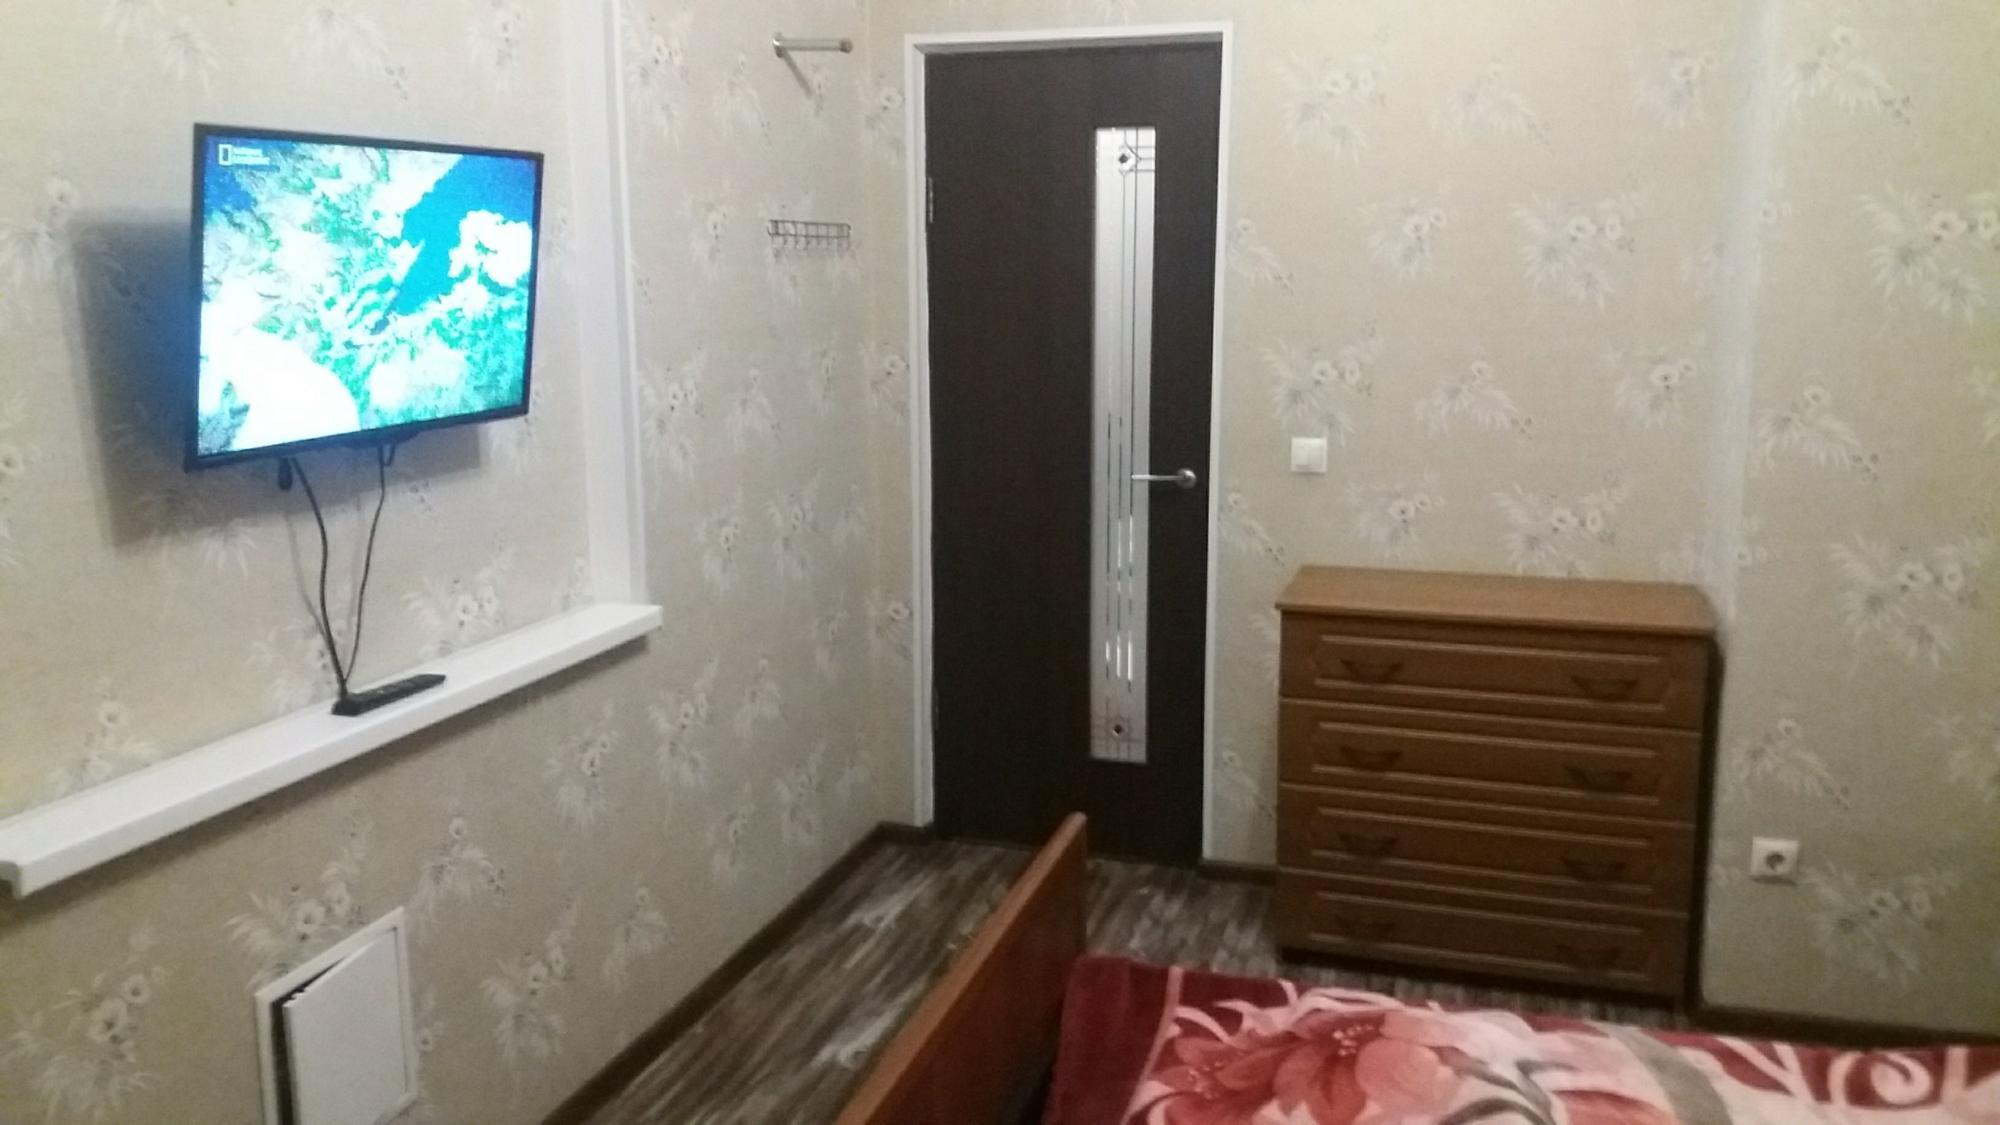 Квартира, 1 комната, 42 м² в Домодедово 89057005352 купить 3